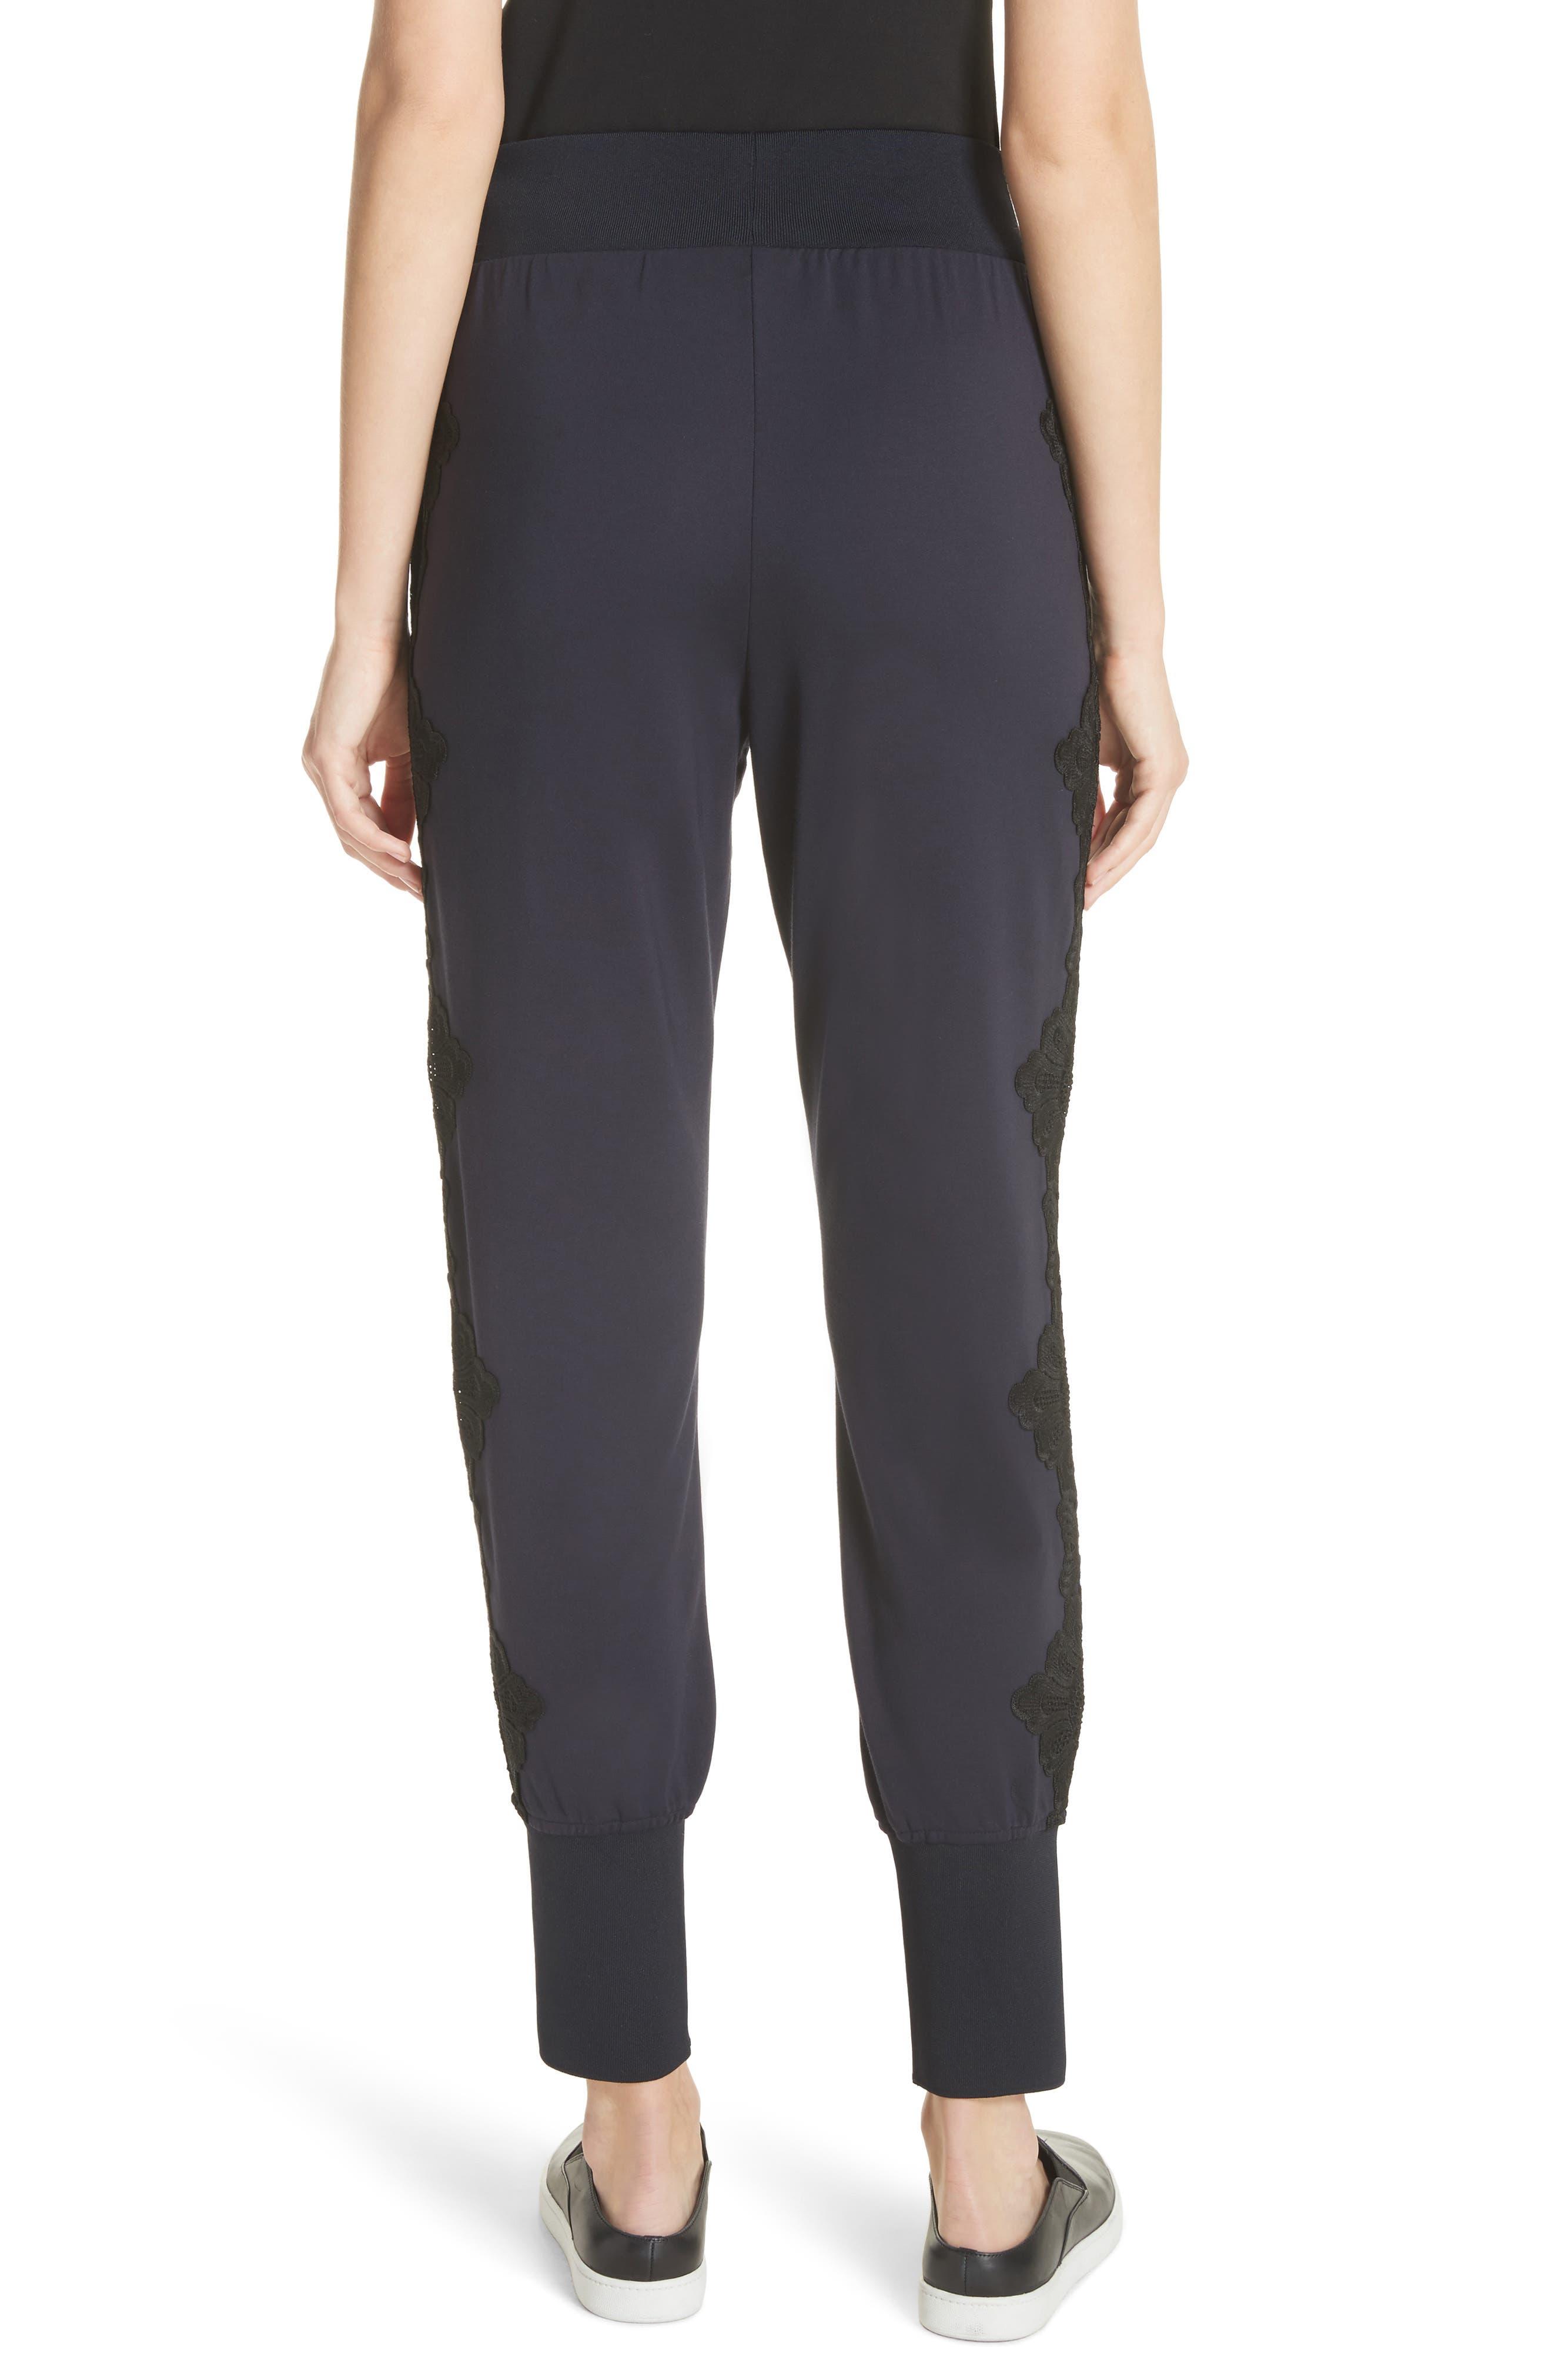 Lizeeba Lace Trim Jogger Pants,                             Alternate thumbnail 2, color,                             Navy